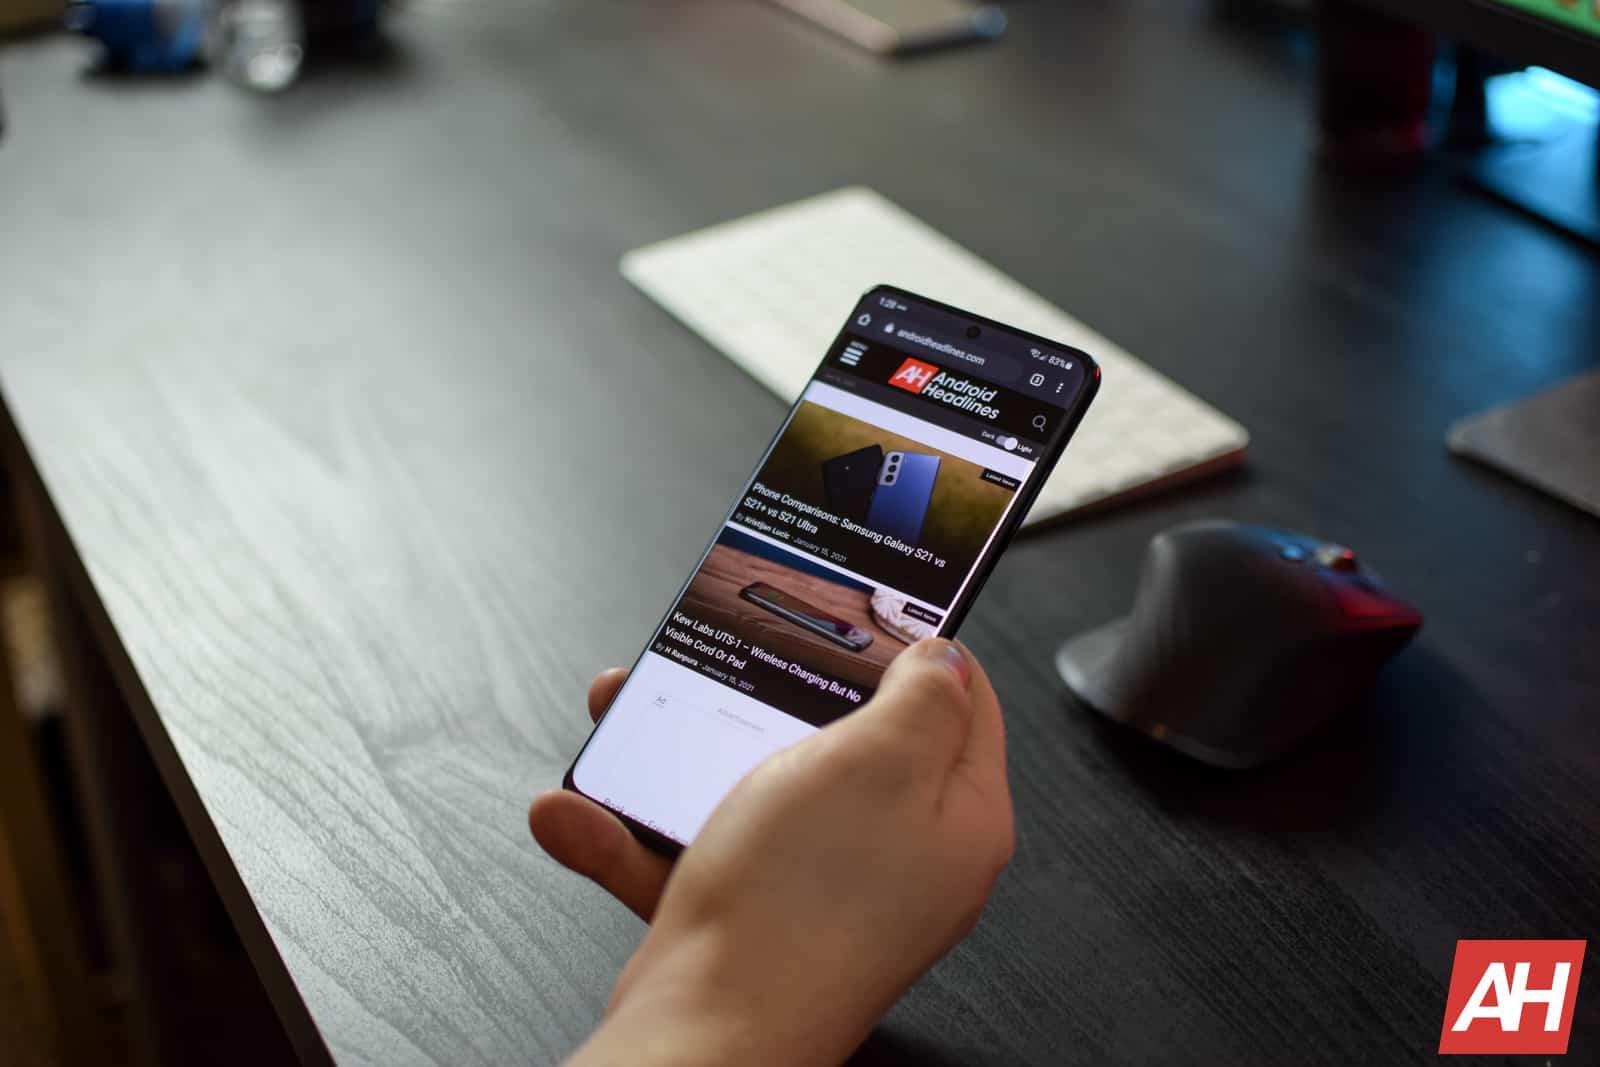 Samsung Galaxy S21 Ultra AH 01